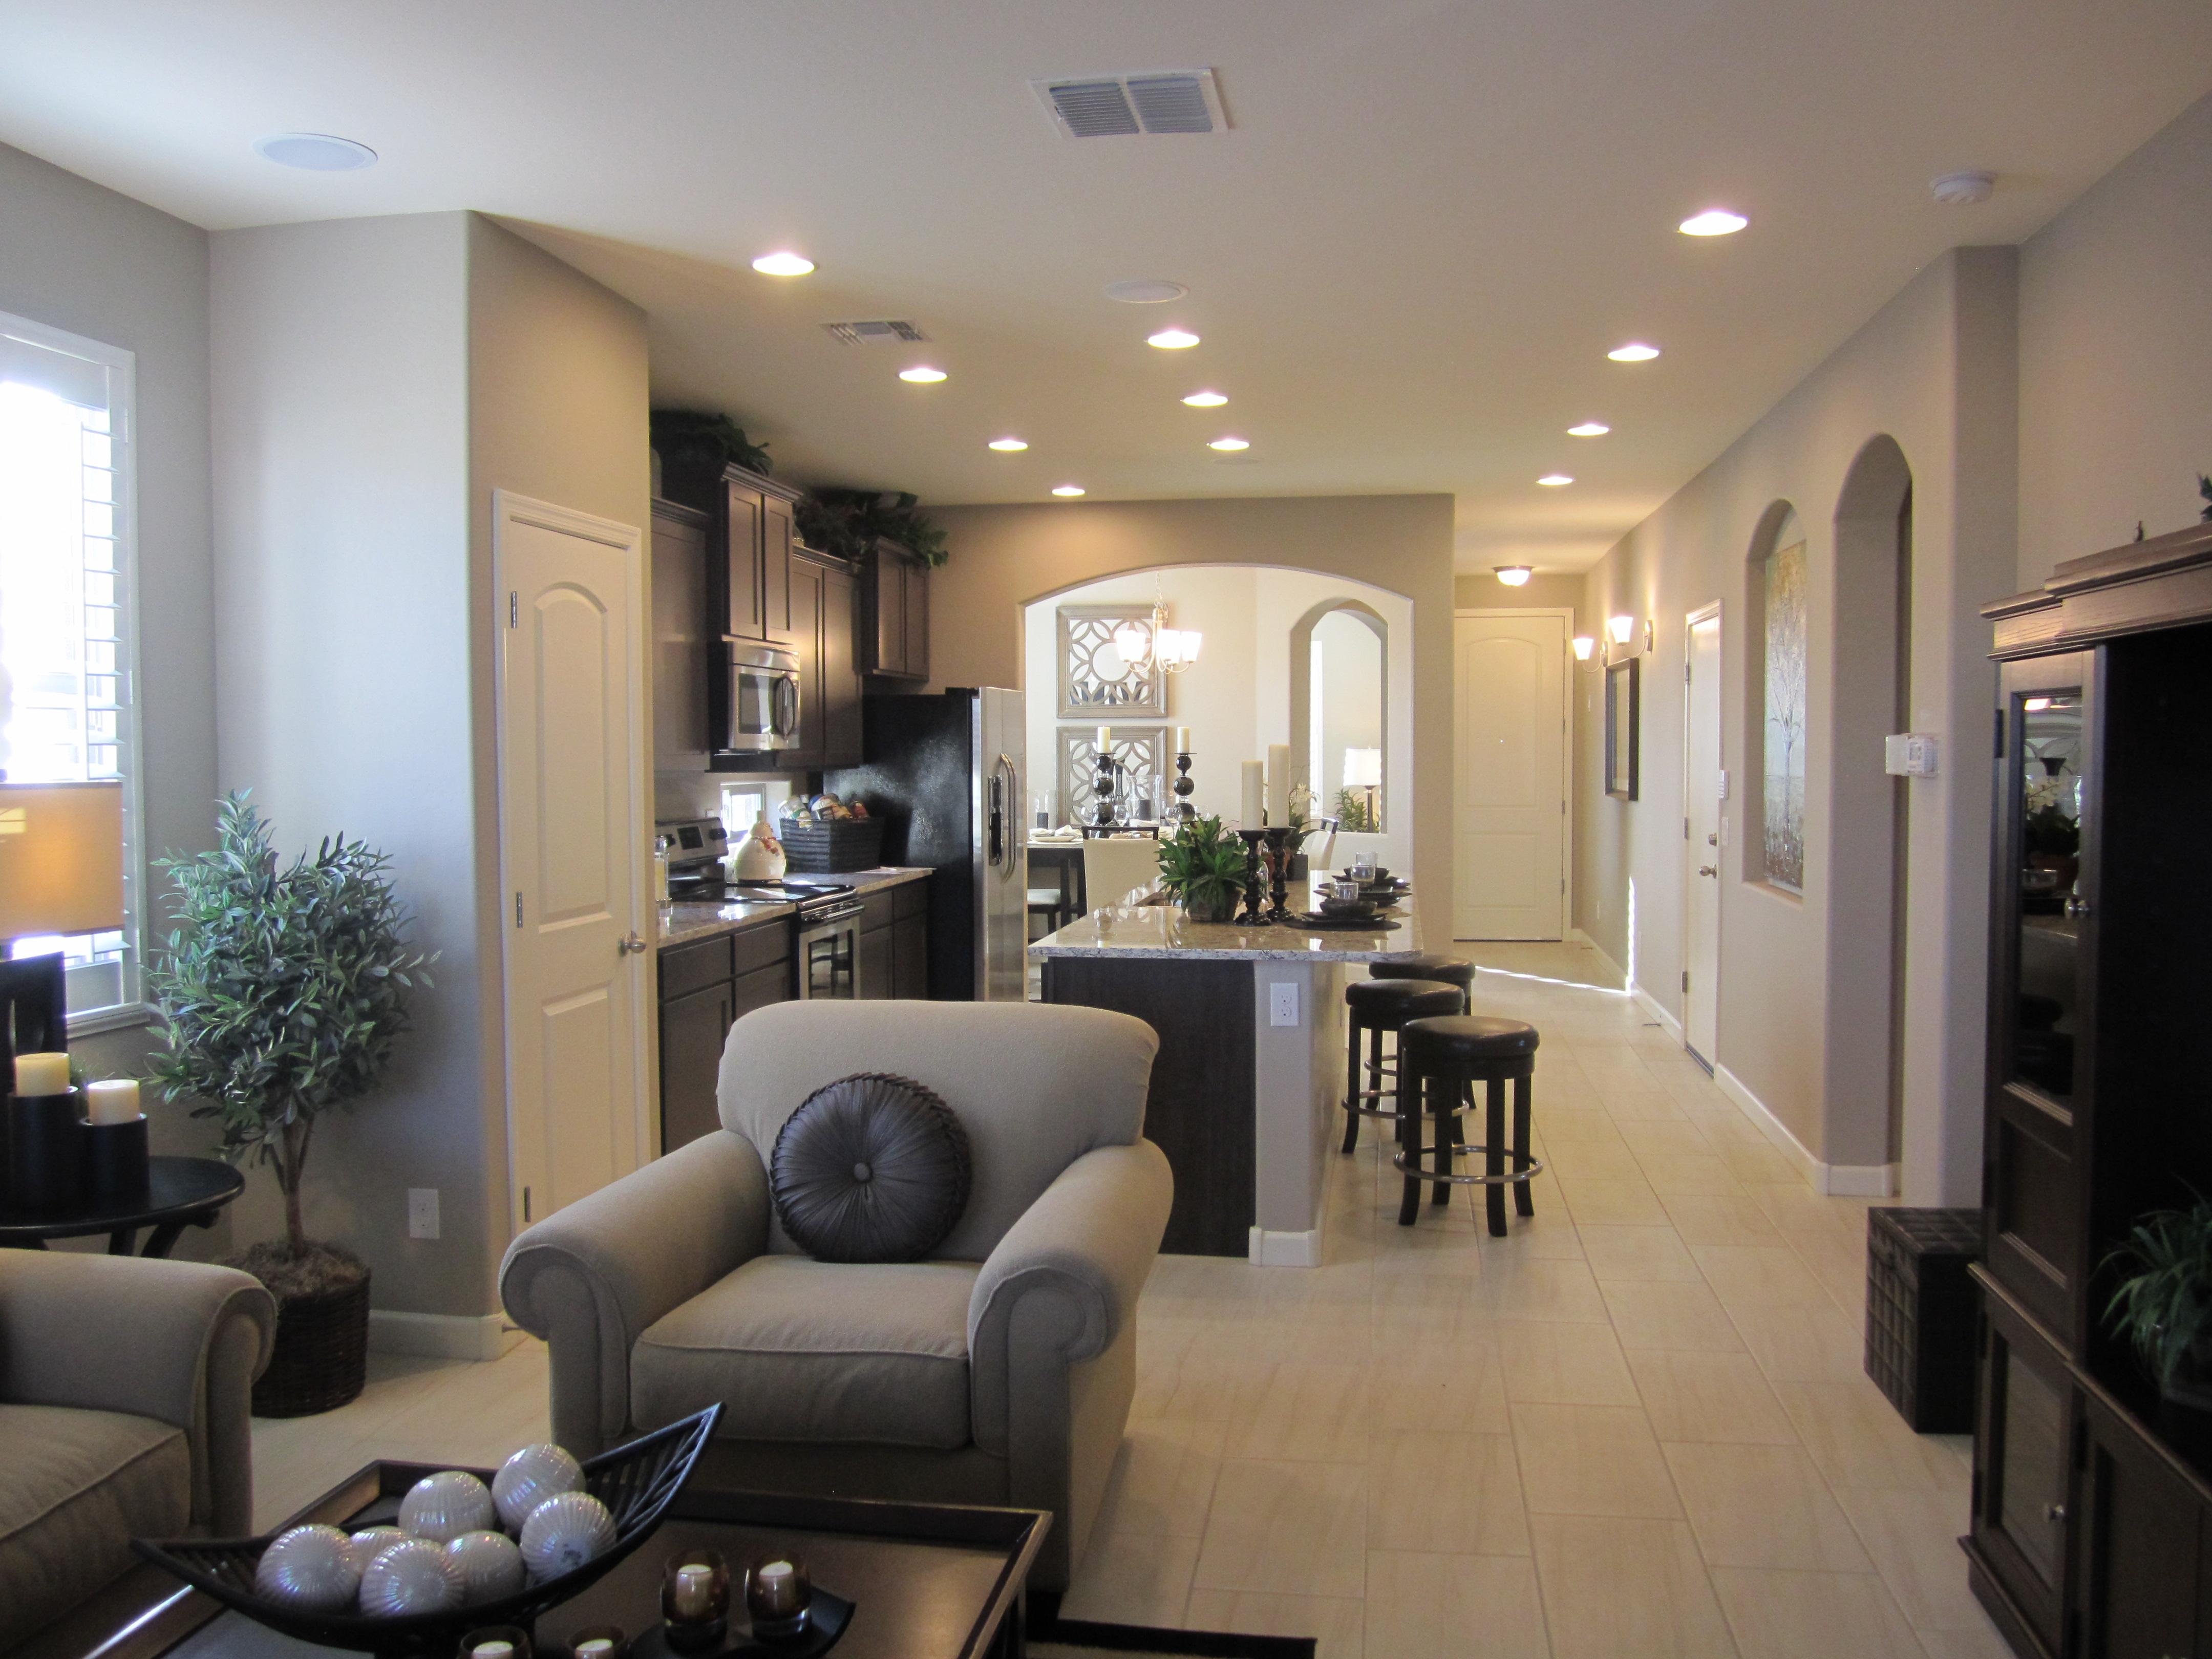 New Construction Homes - Infill in Mesa AZ